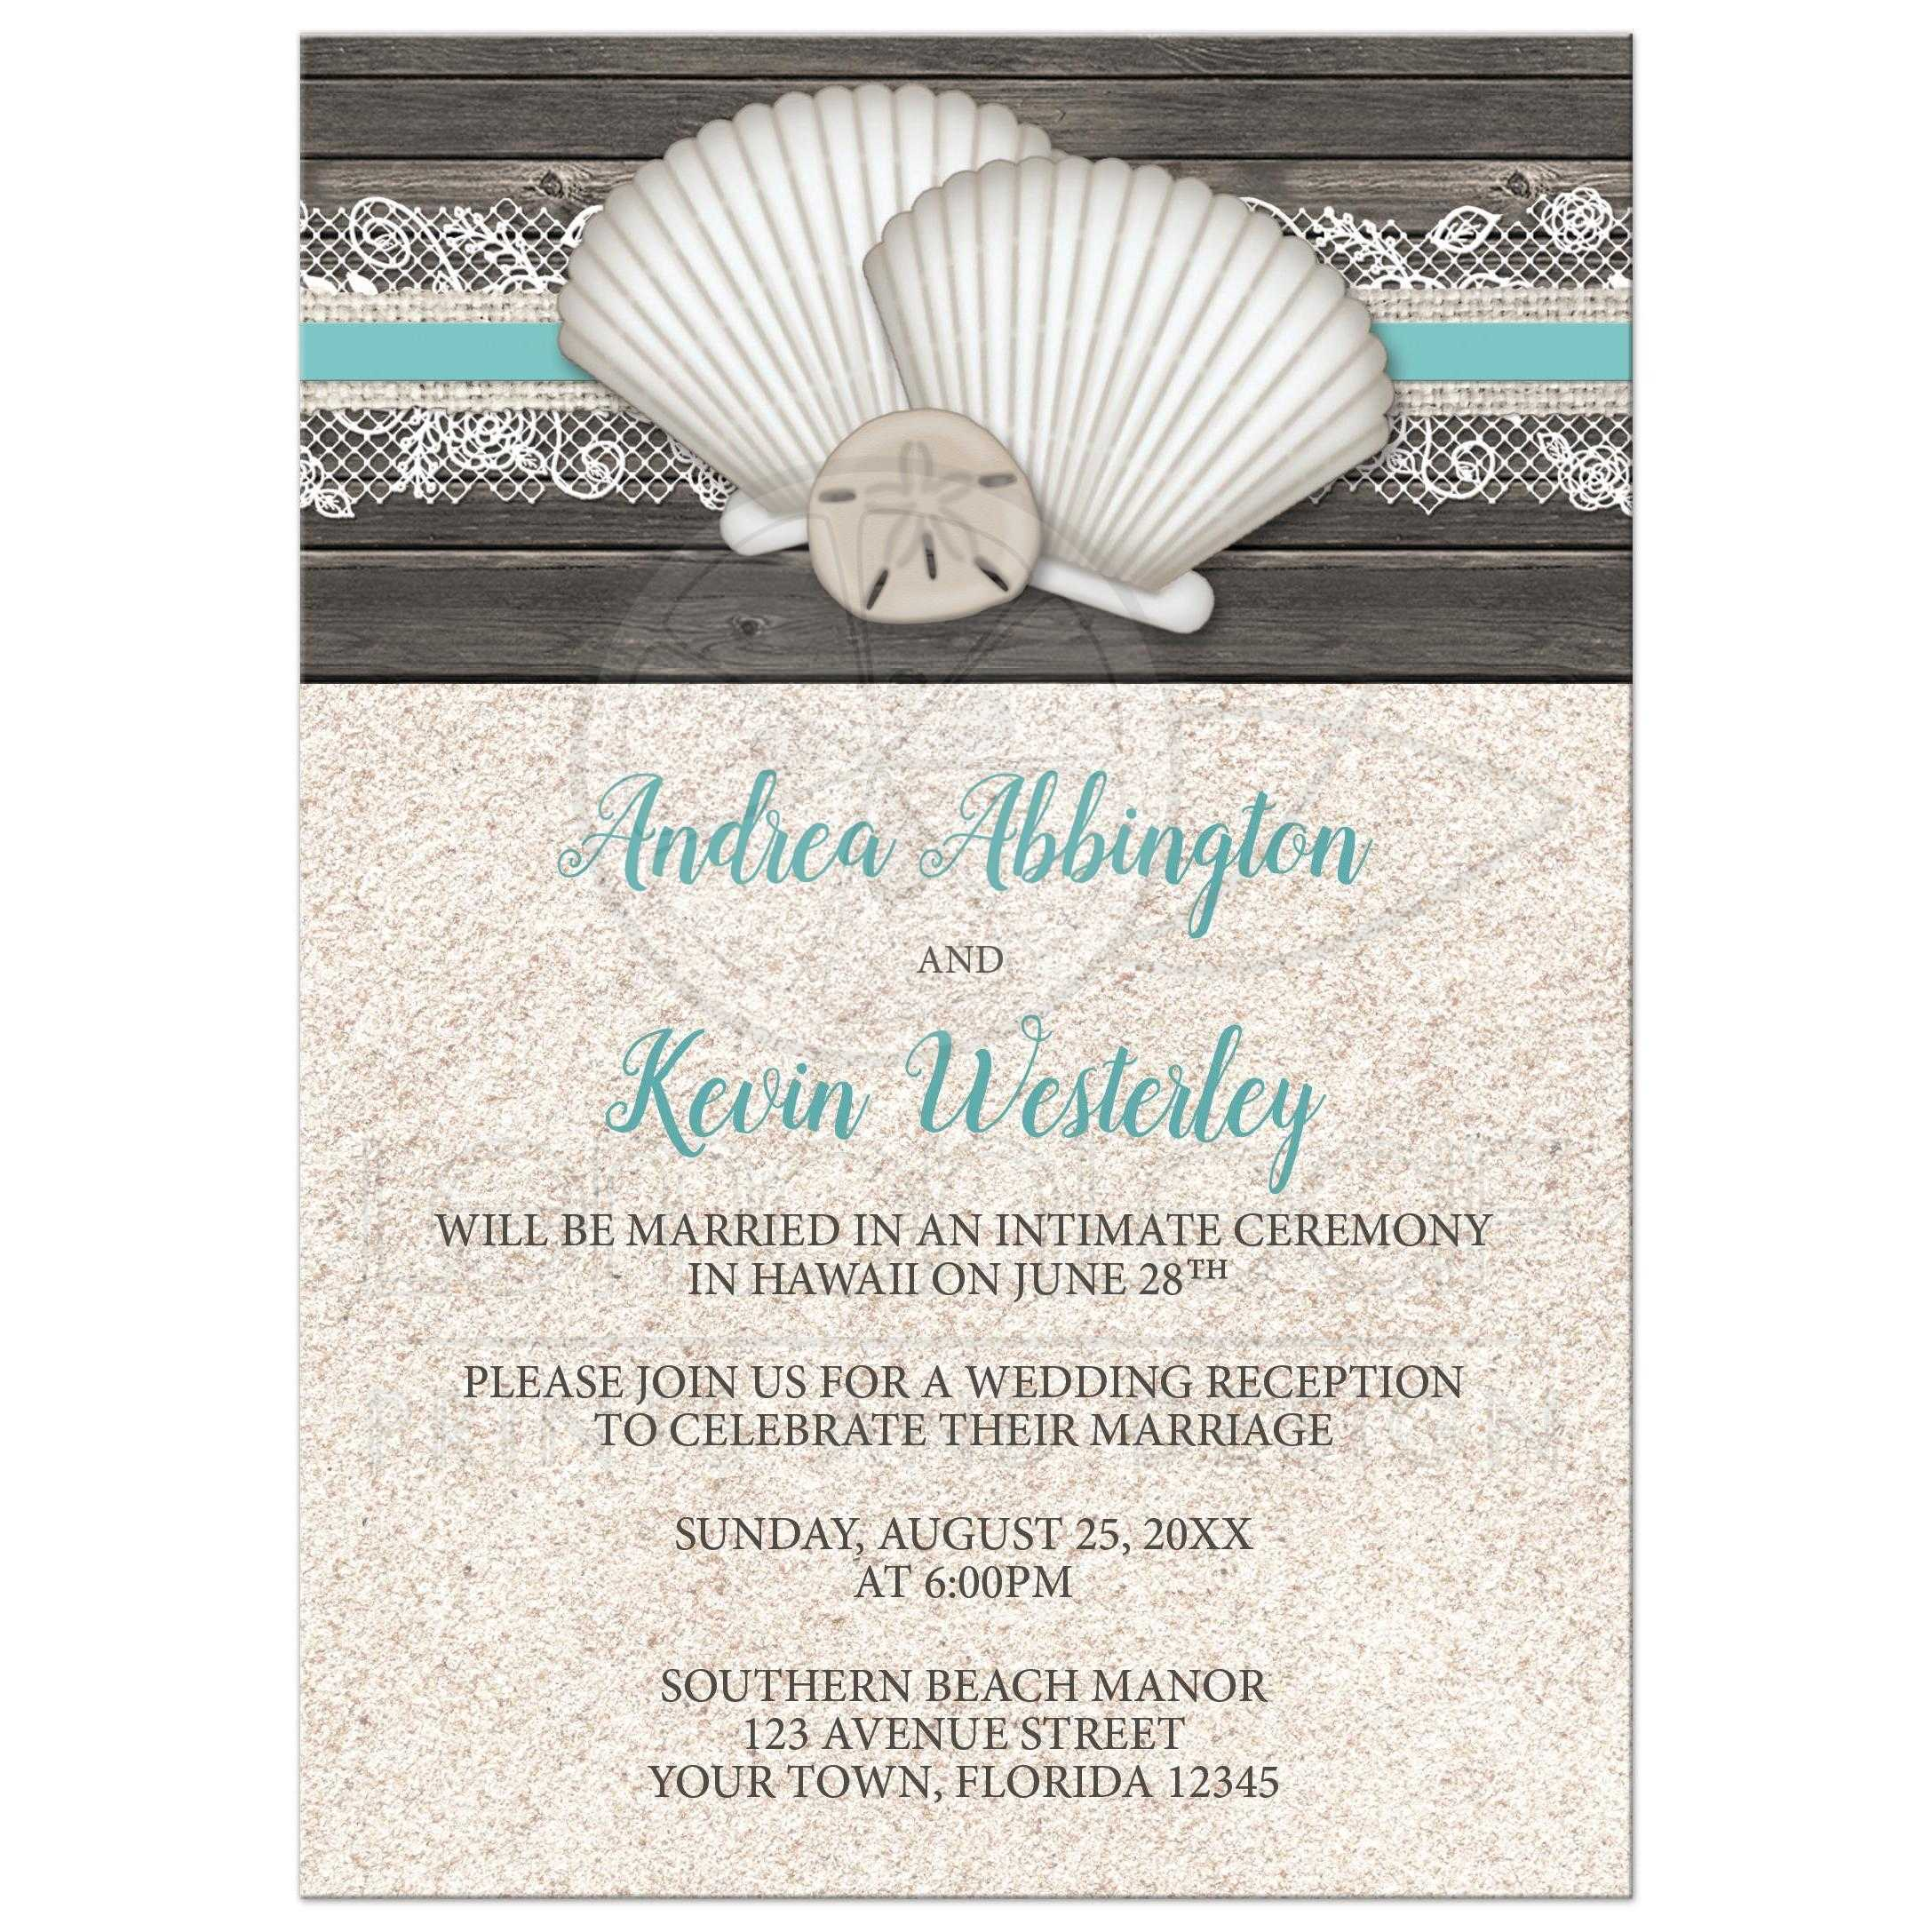 wedding reception invitations reception only wedding invitations Reception Only Wedding Invitations